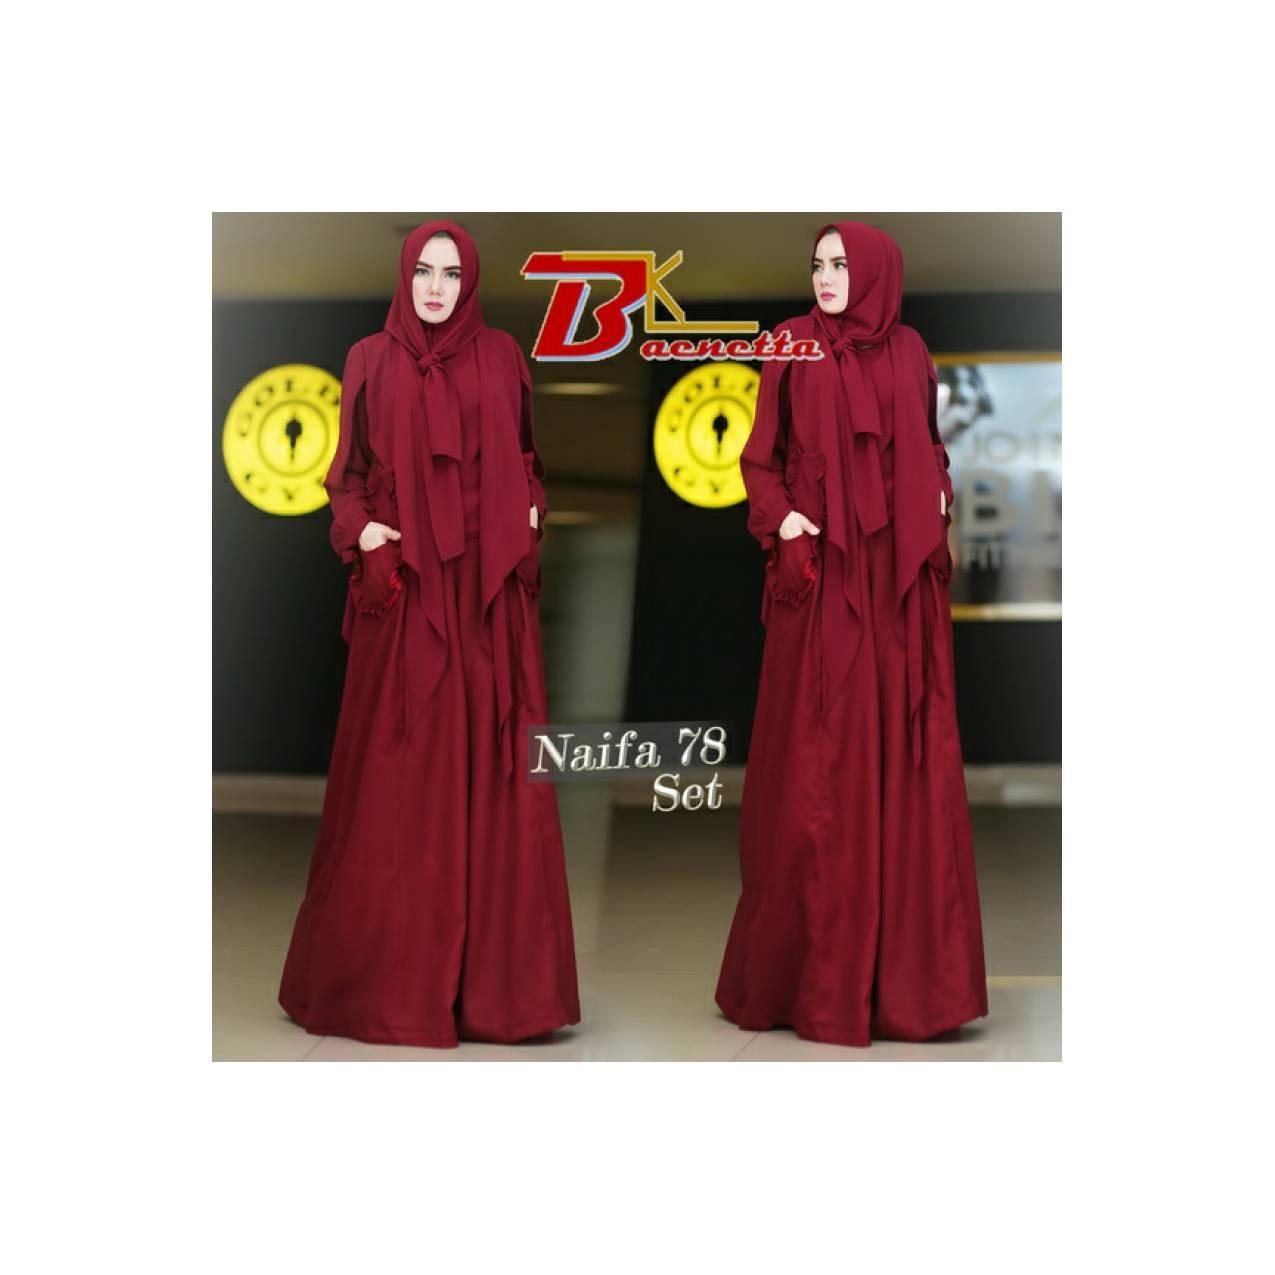 List Harga Setelan Hijab Jasmin 3in1 Terbaru Kini 1 Baju Muslim 3 In Blouse Kulot Hoodie Linen Rami